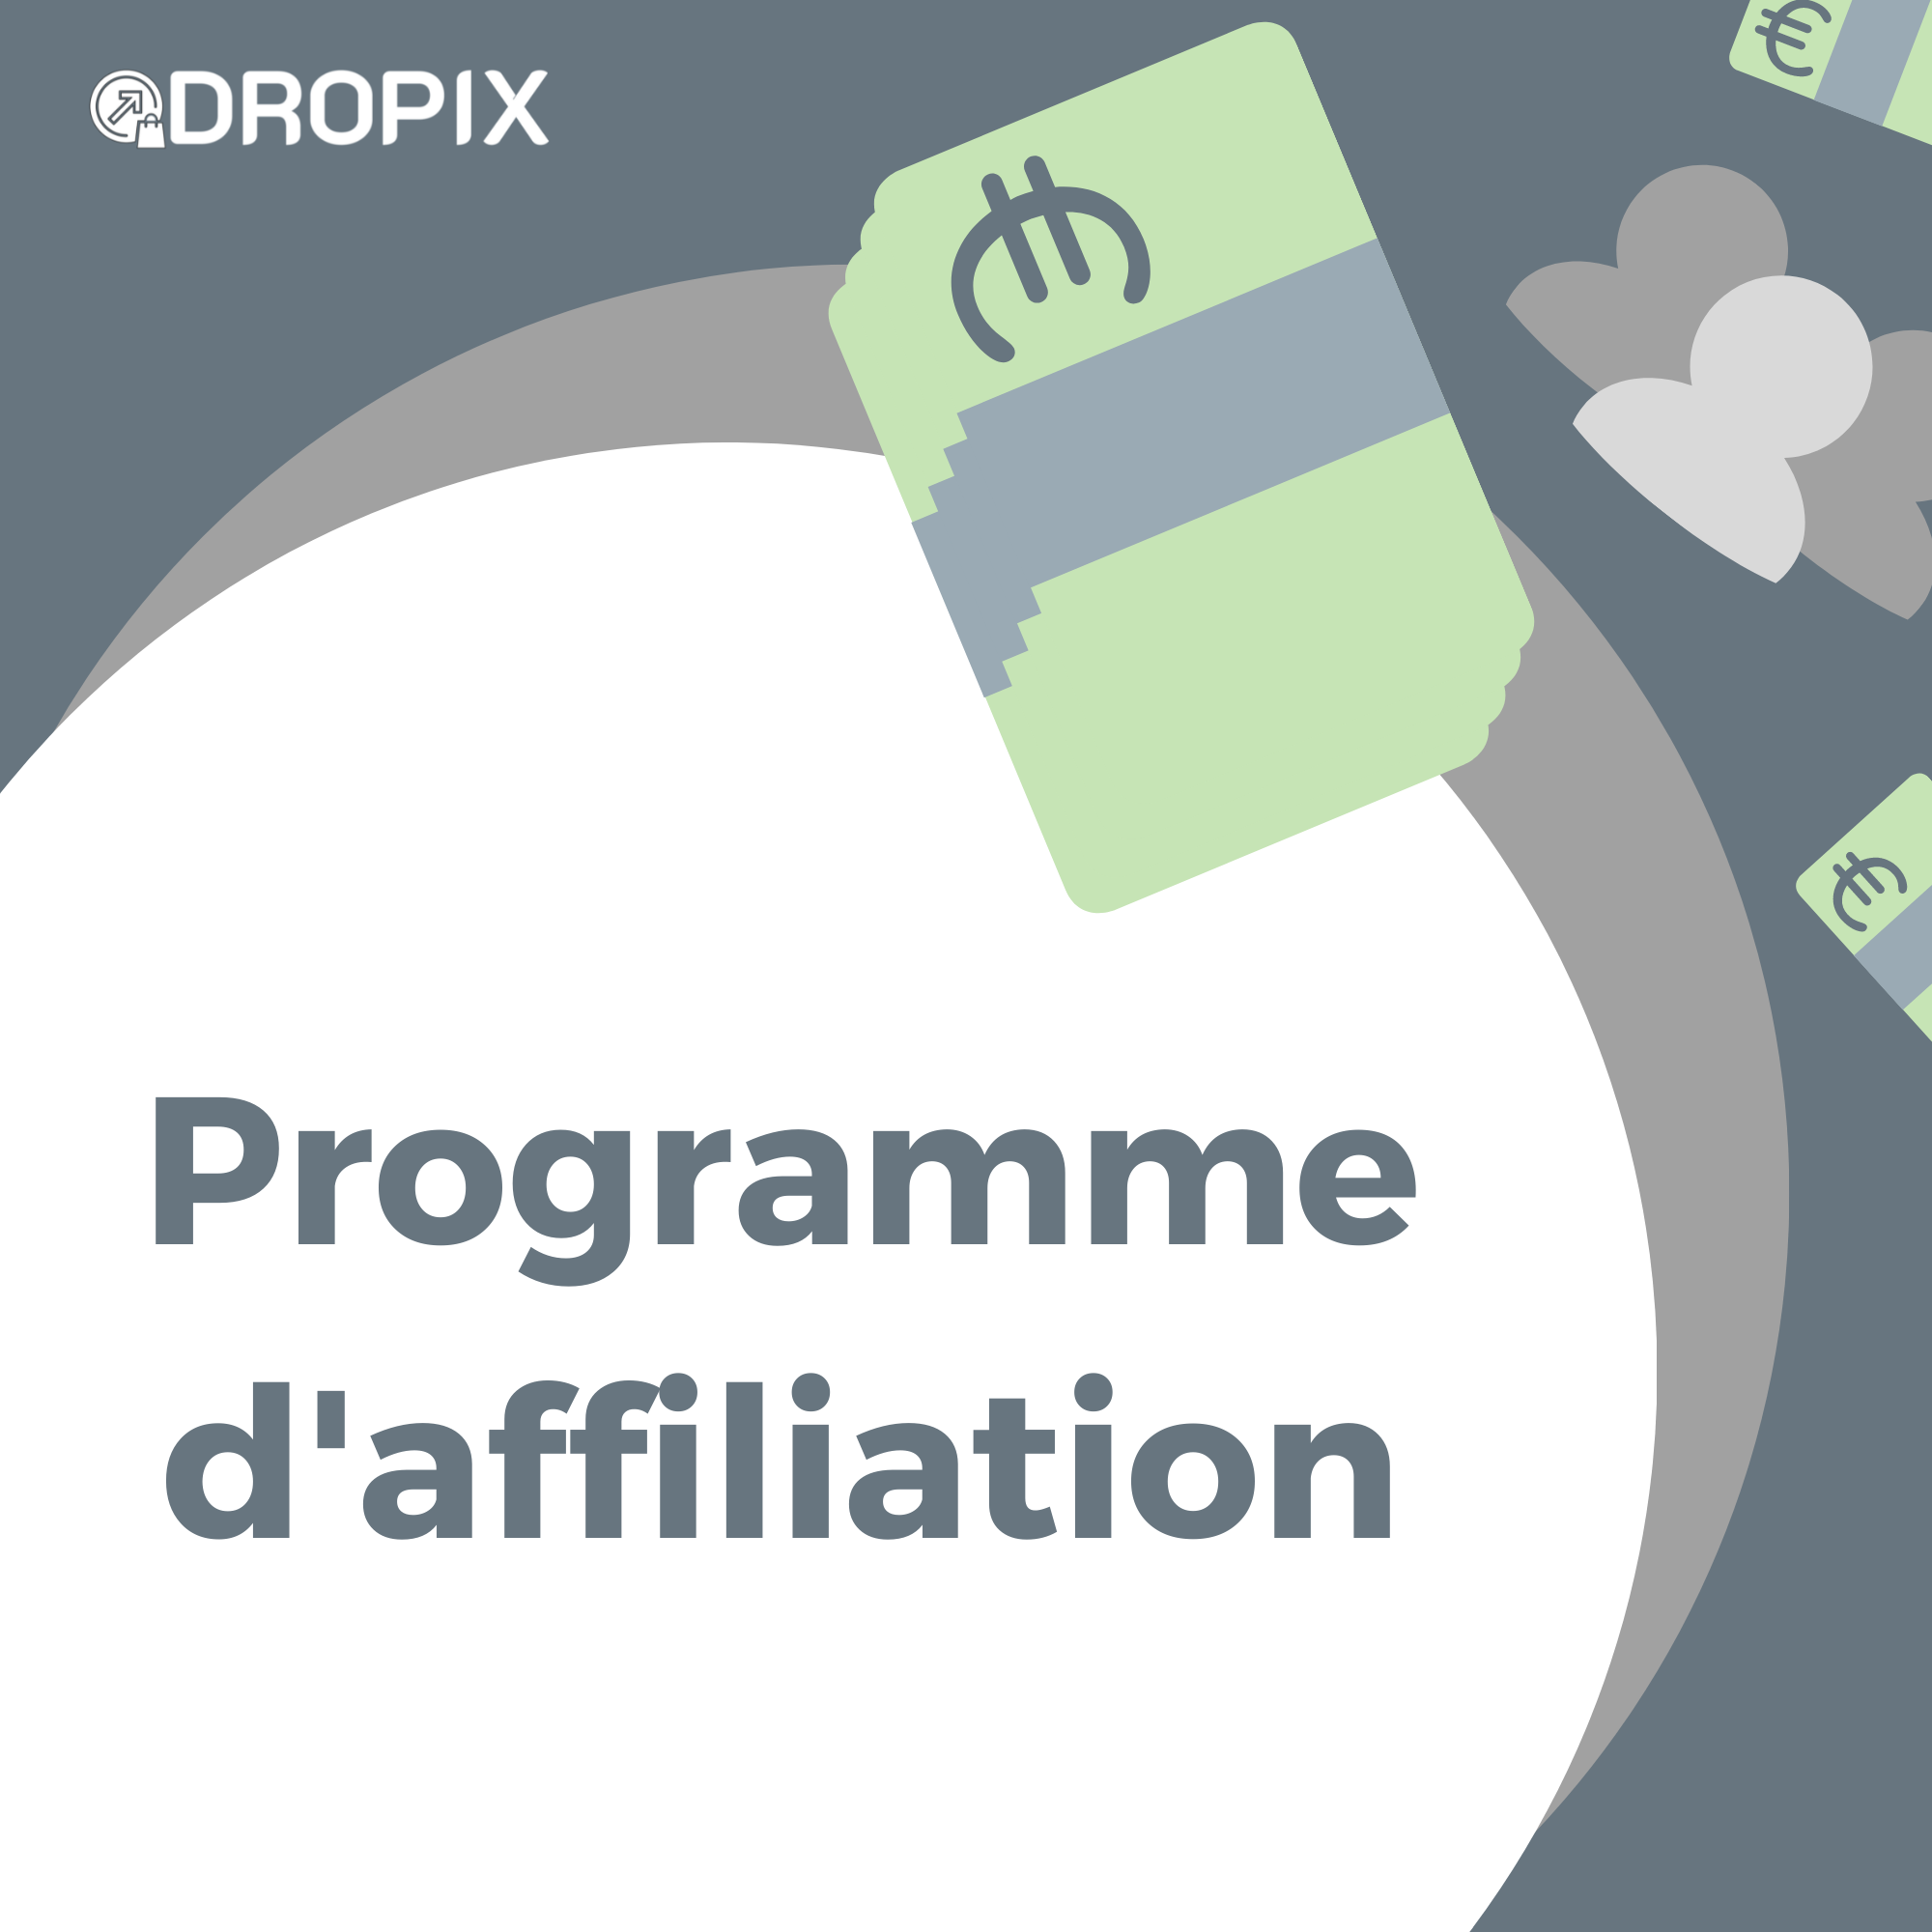 Dropix Affiliate Program